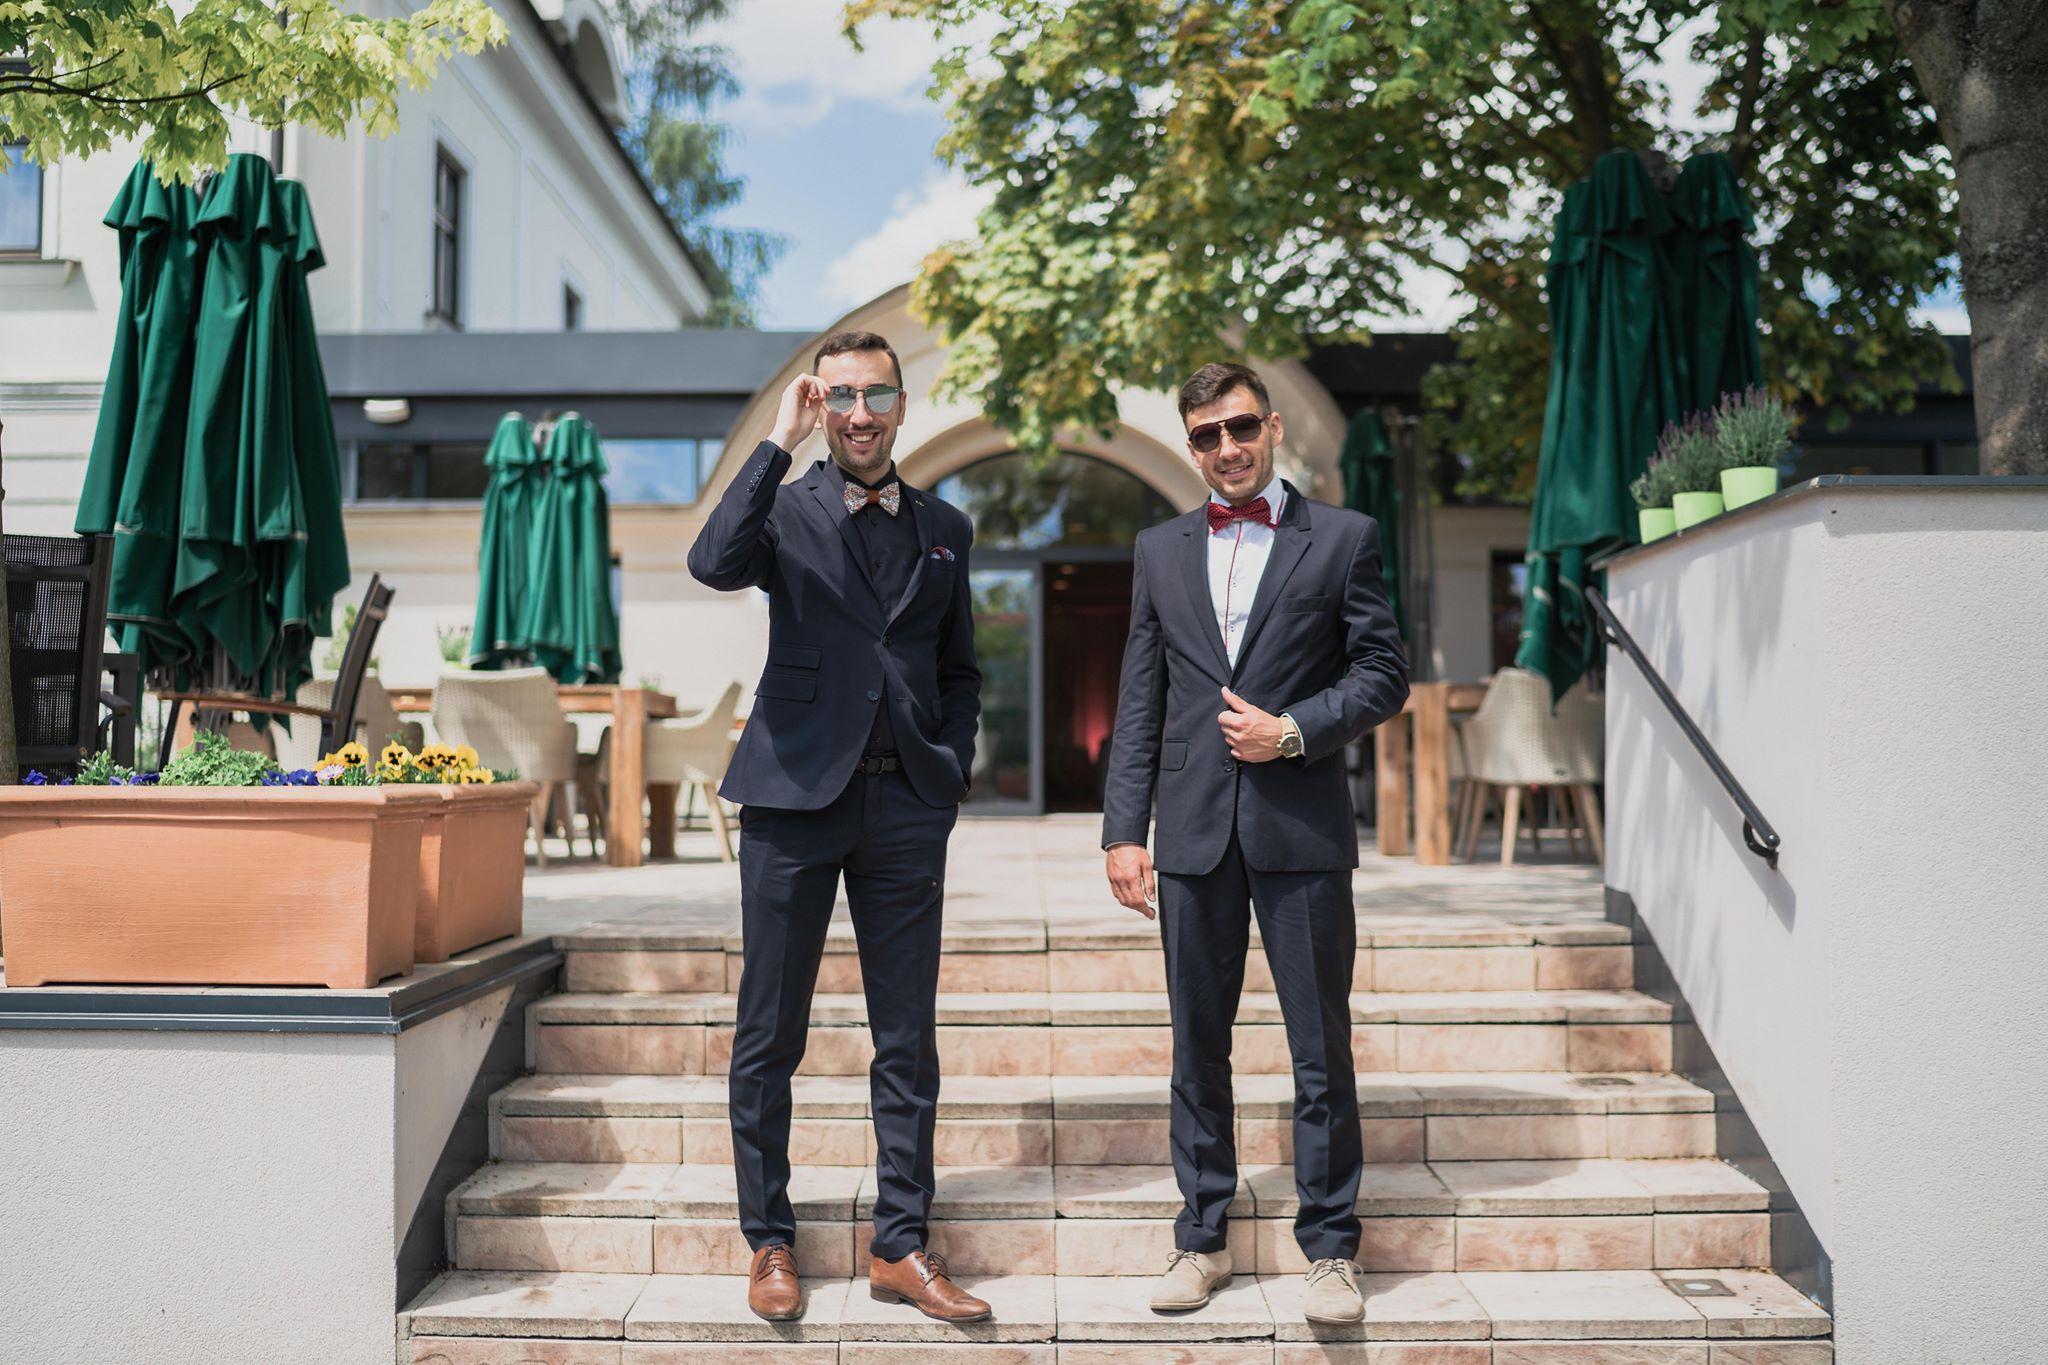 svadba zilina moderator starejsi zabavac villa necasjpg